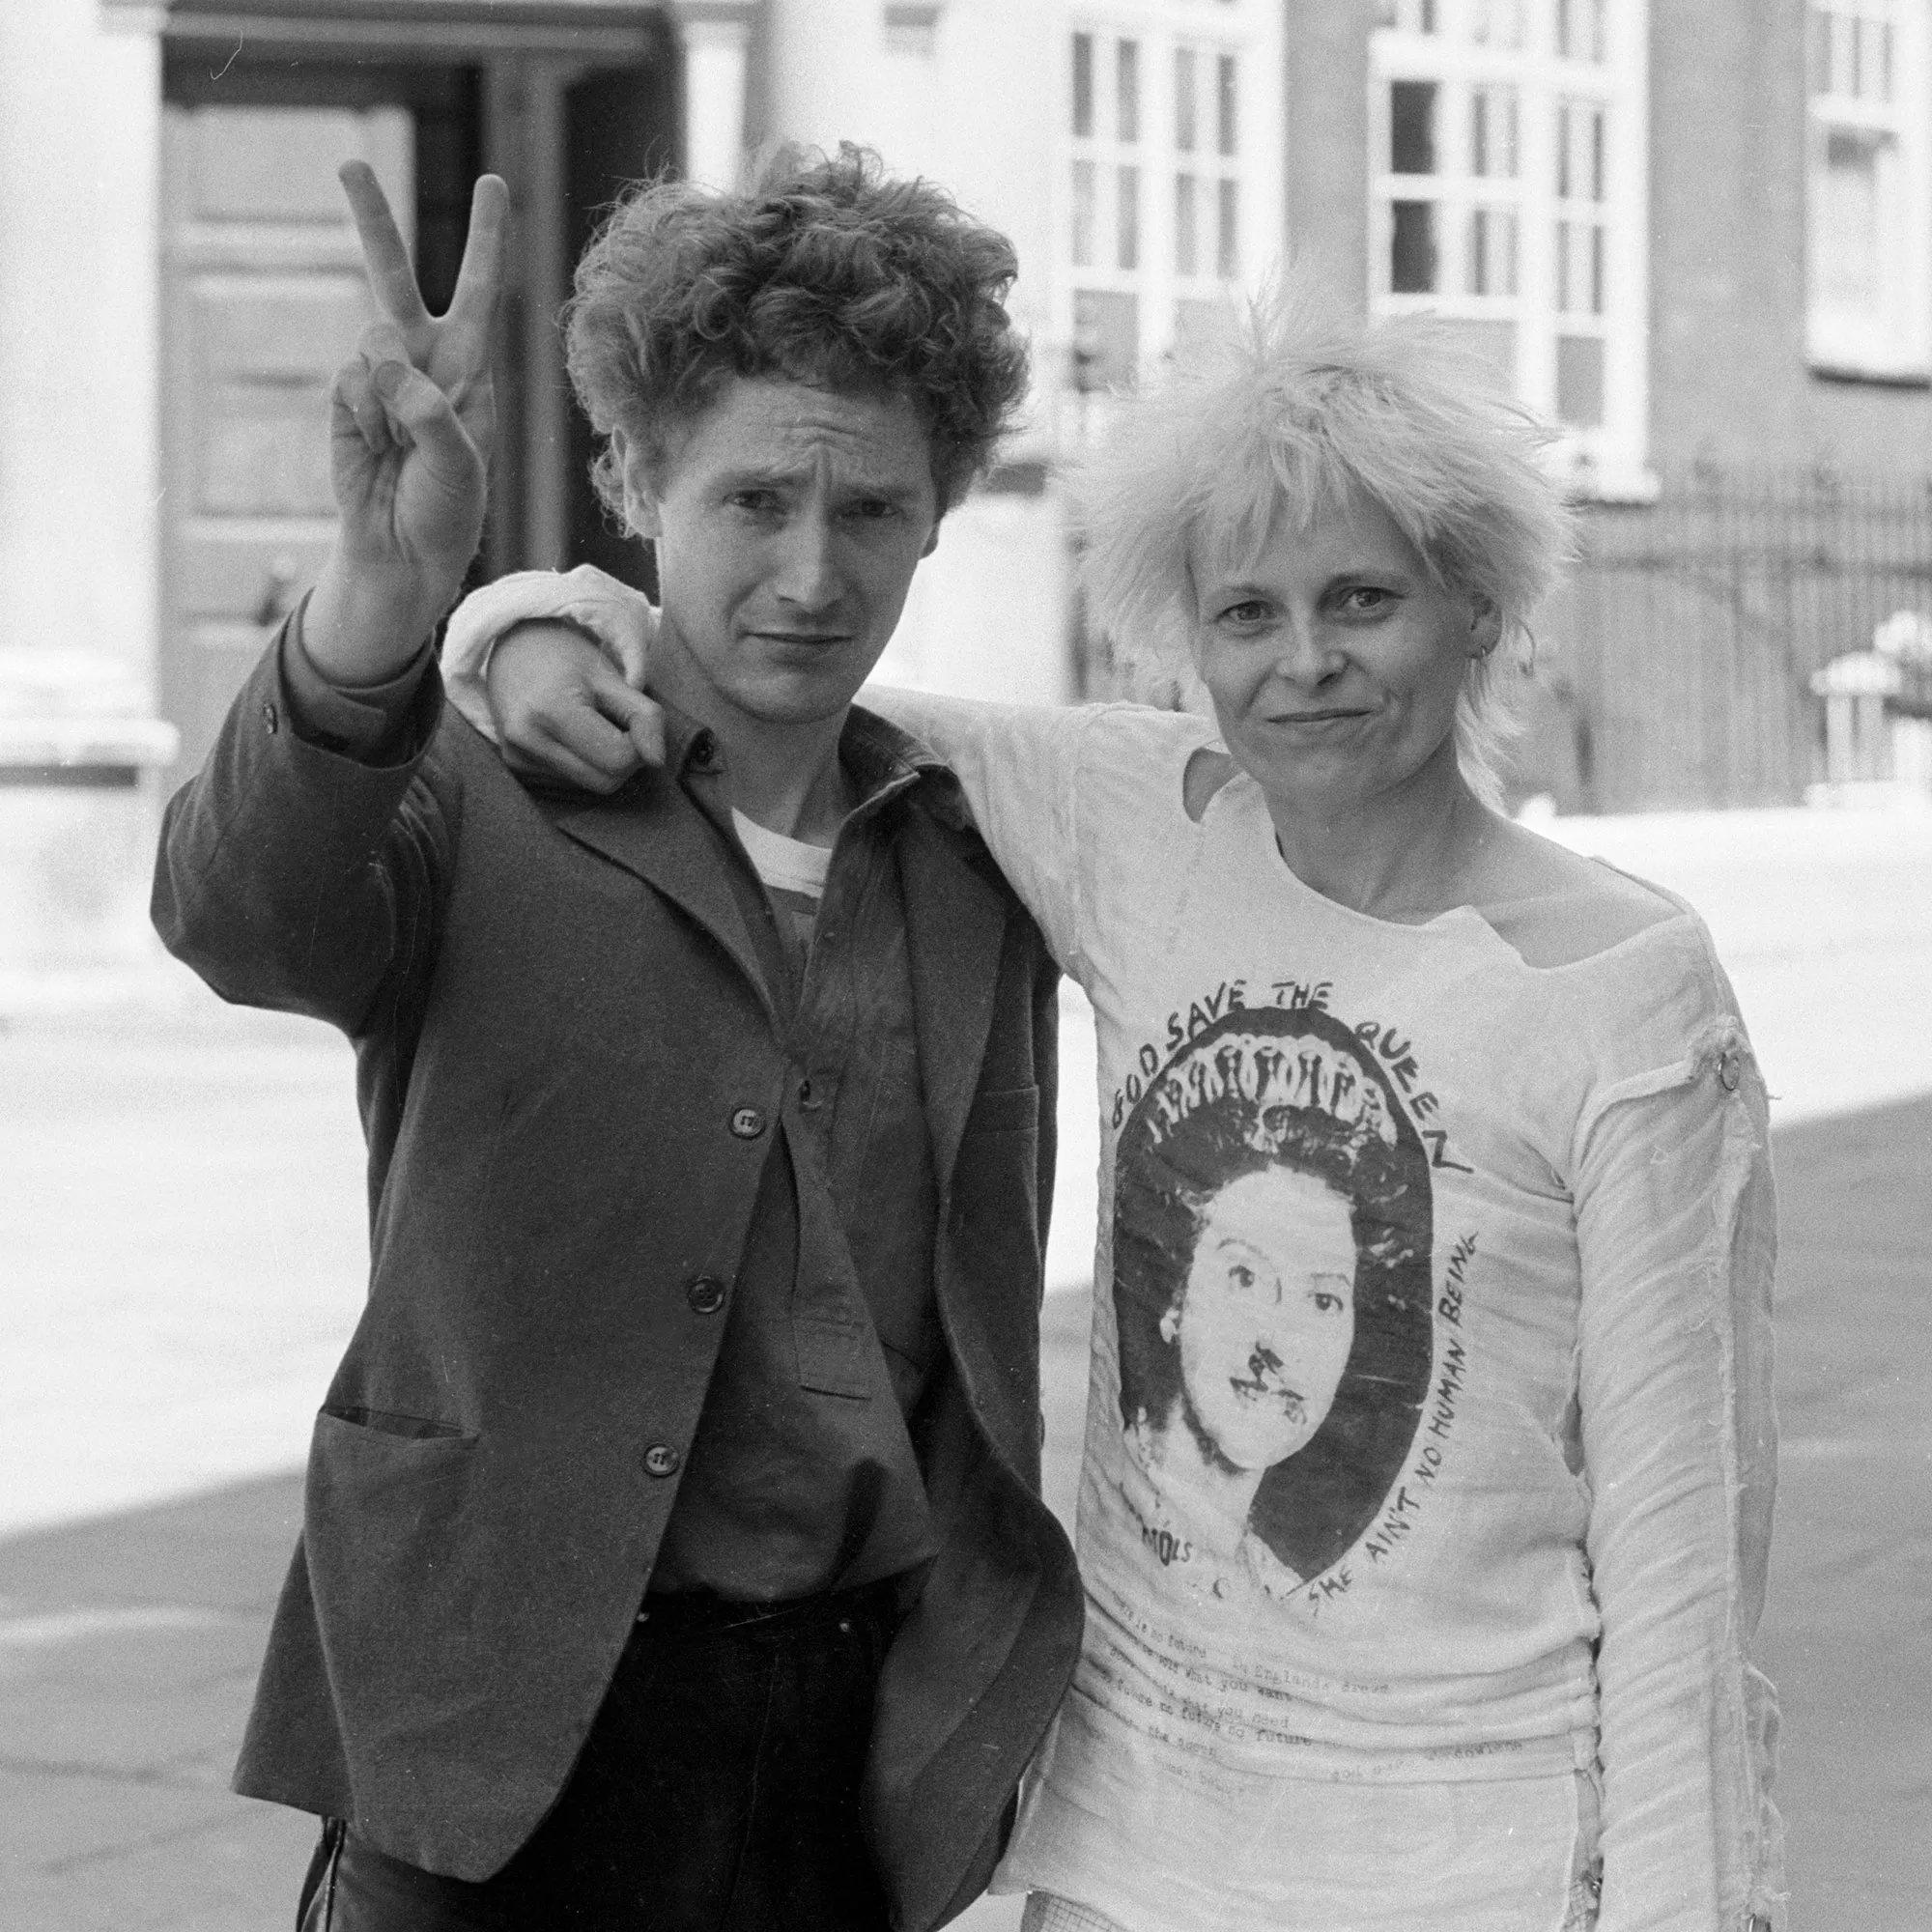 Image via Vivienne Westwood